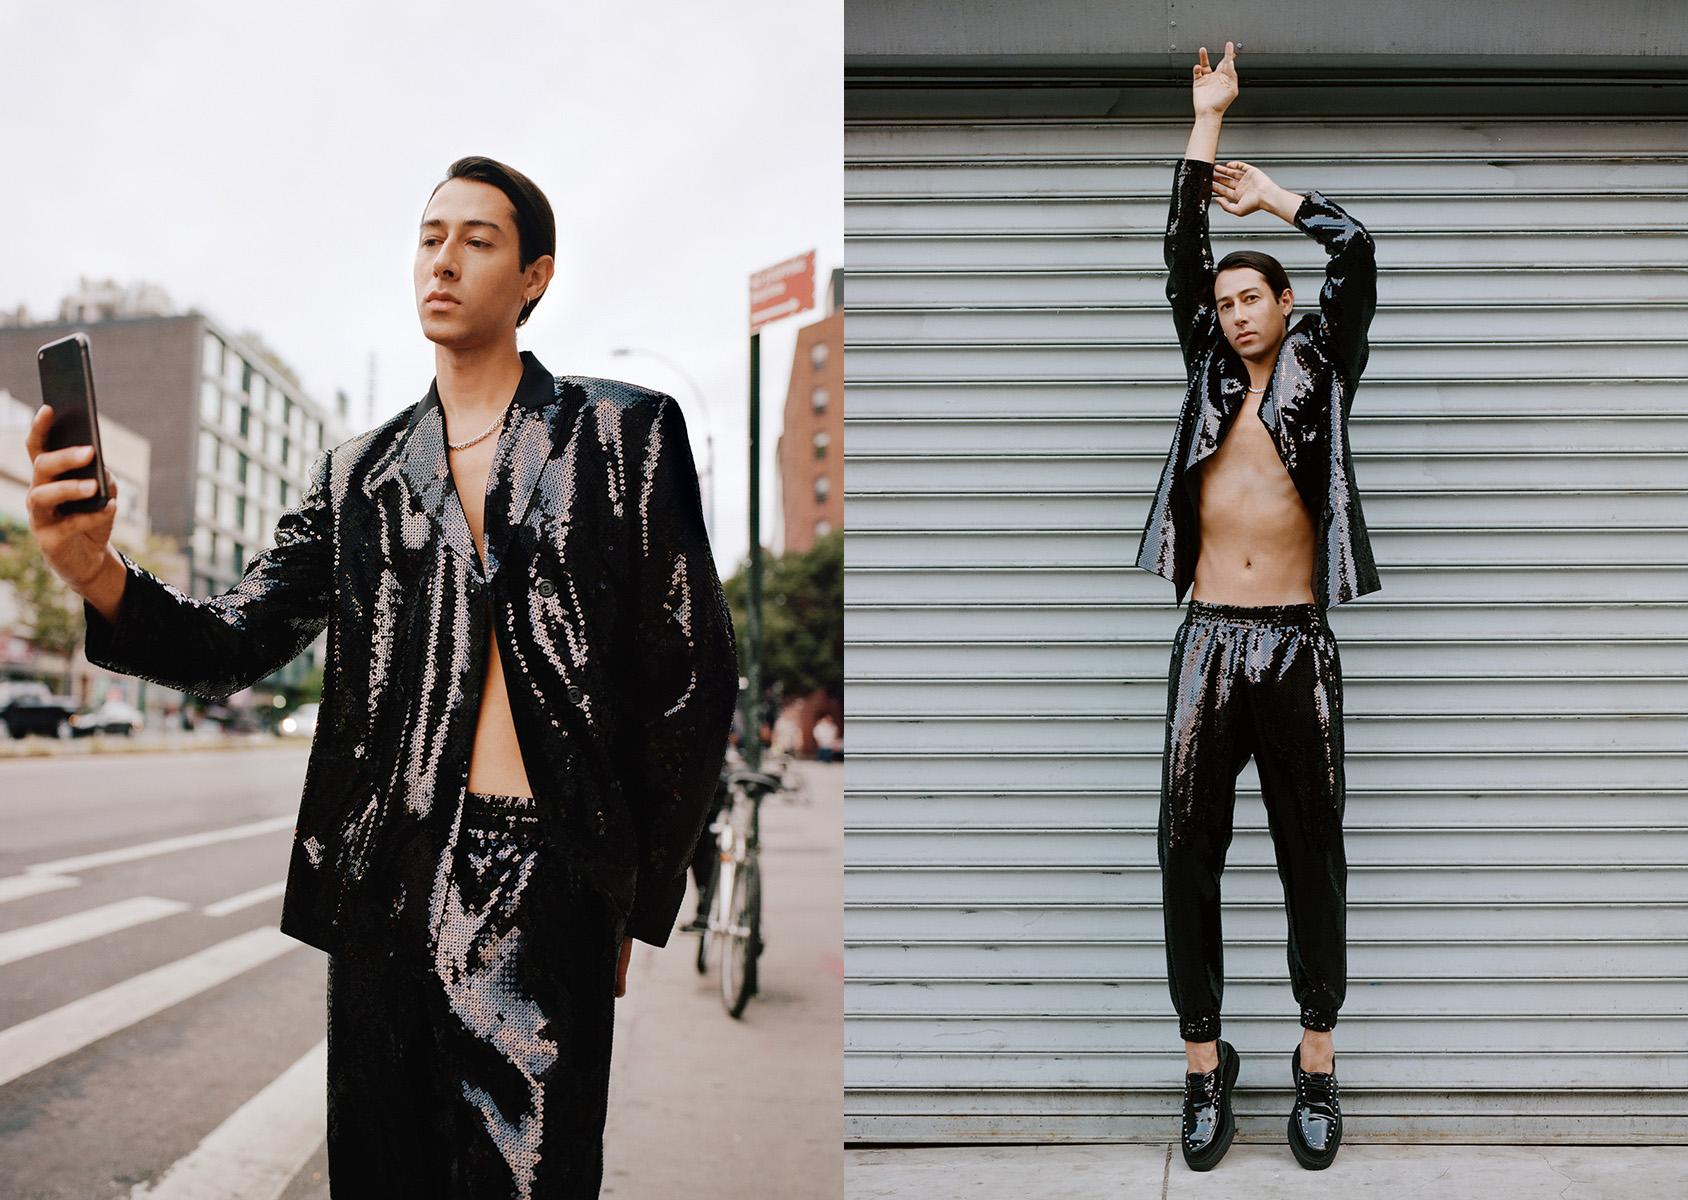 Kindness wearing GIAMBATTISTA VALLI x H&M sequined jacket and pants. GIAMBATTISTA VALLI x H&M creepers